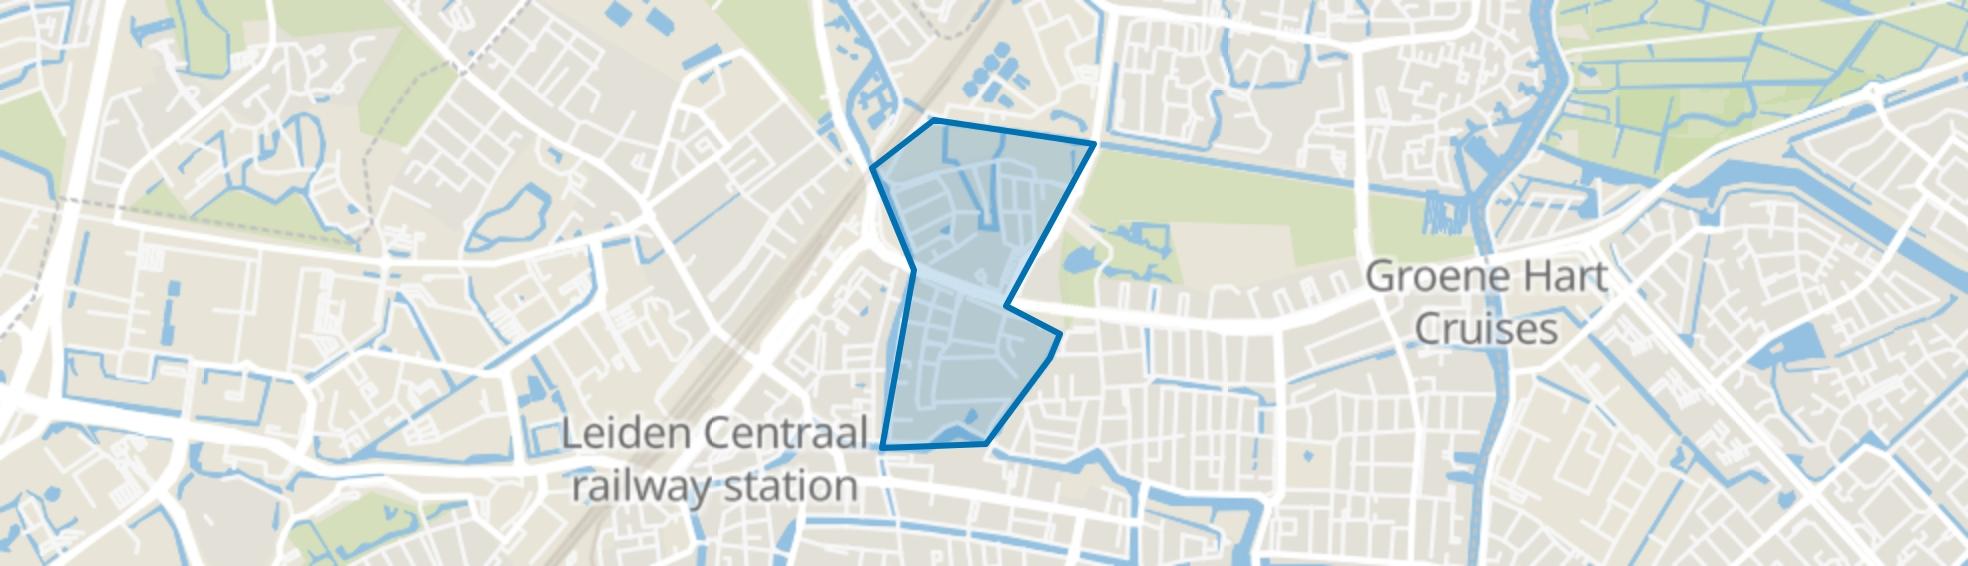 Groenoord, Leiden map